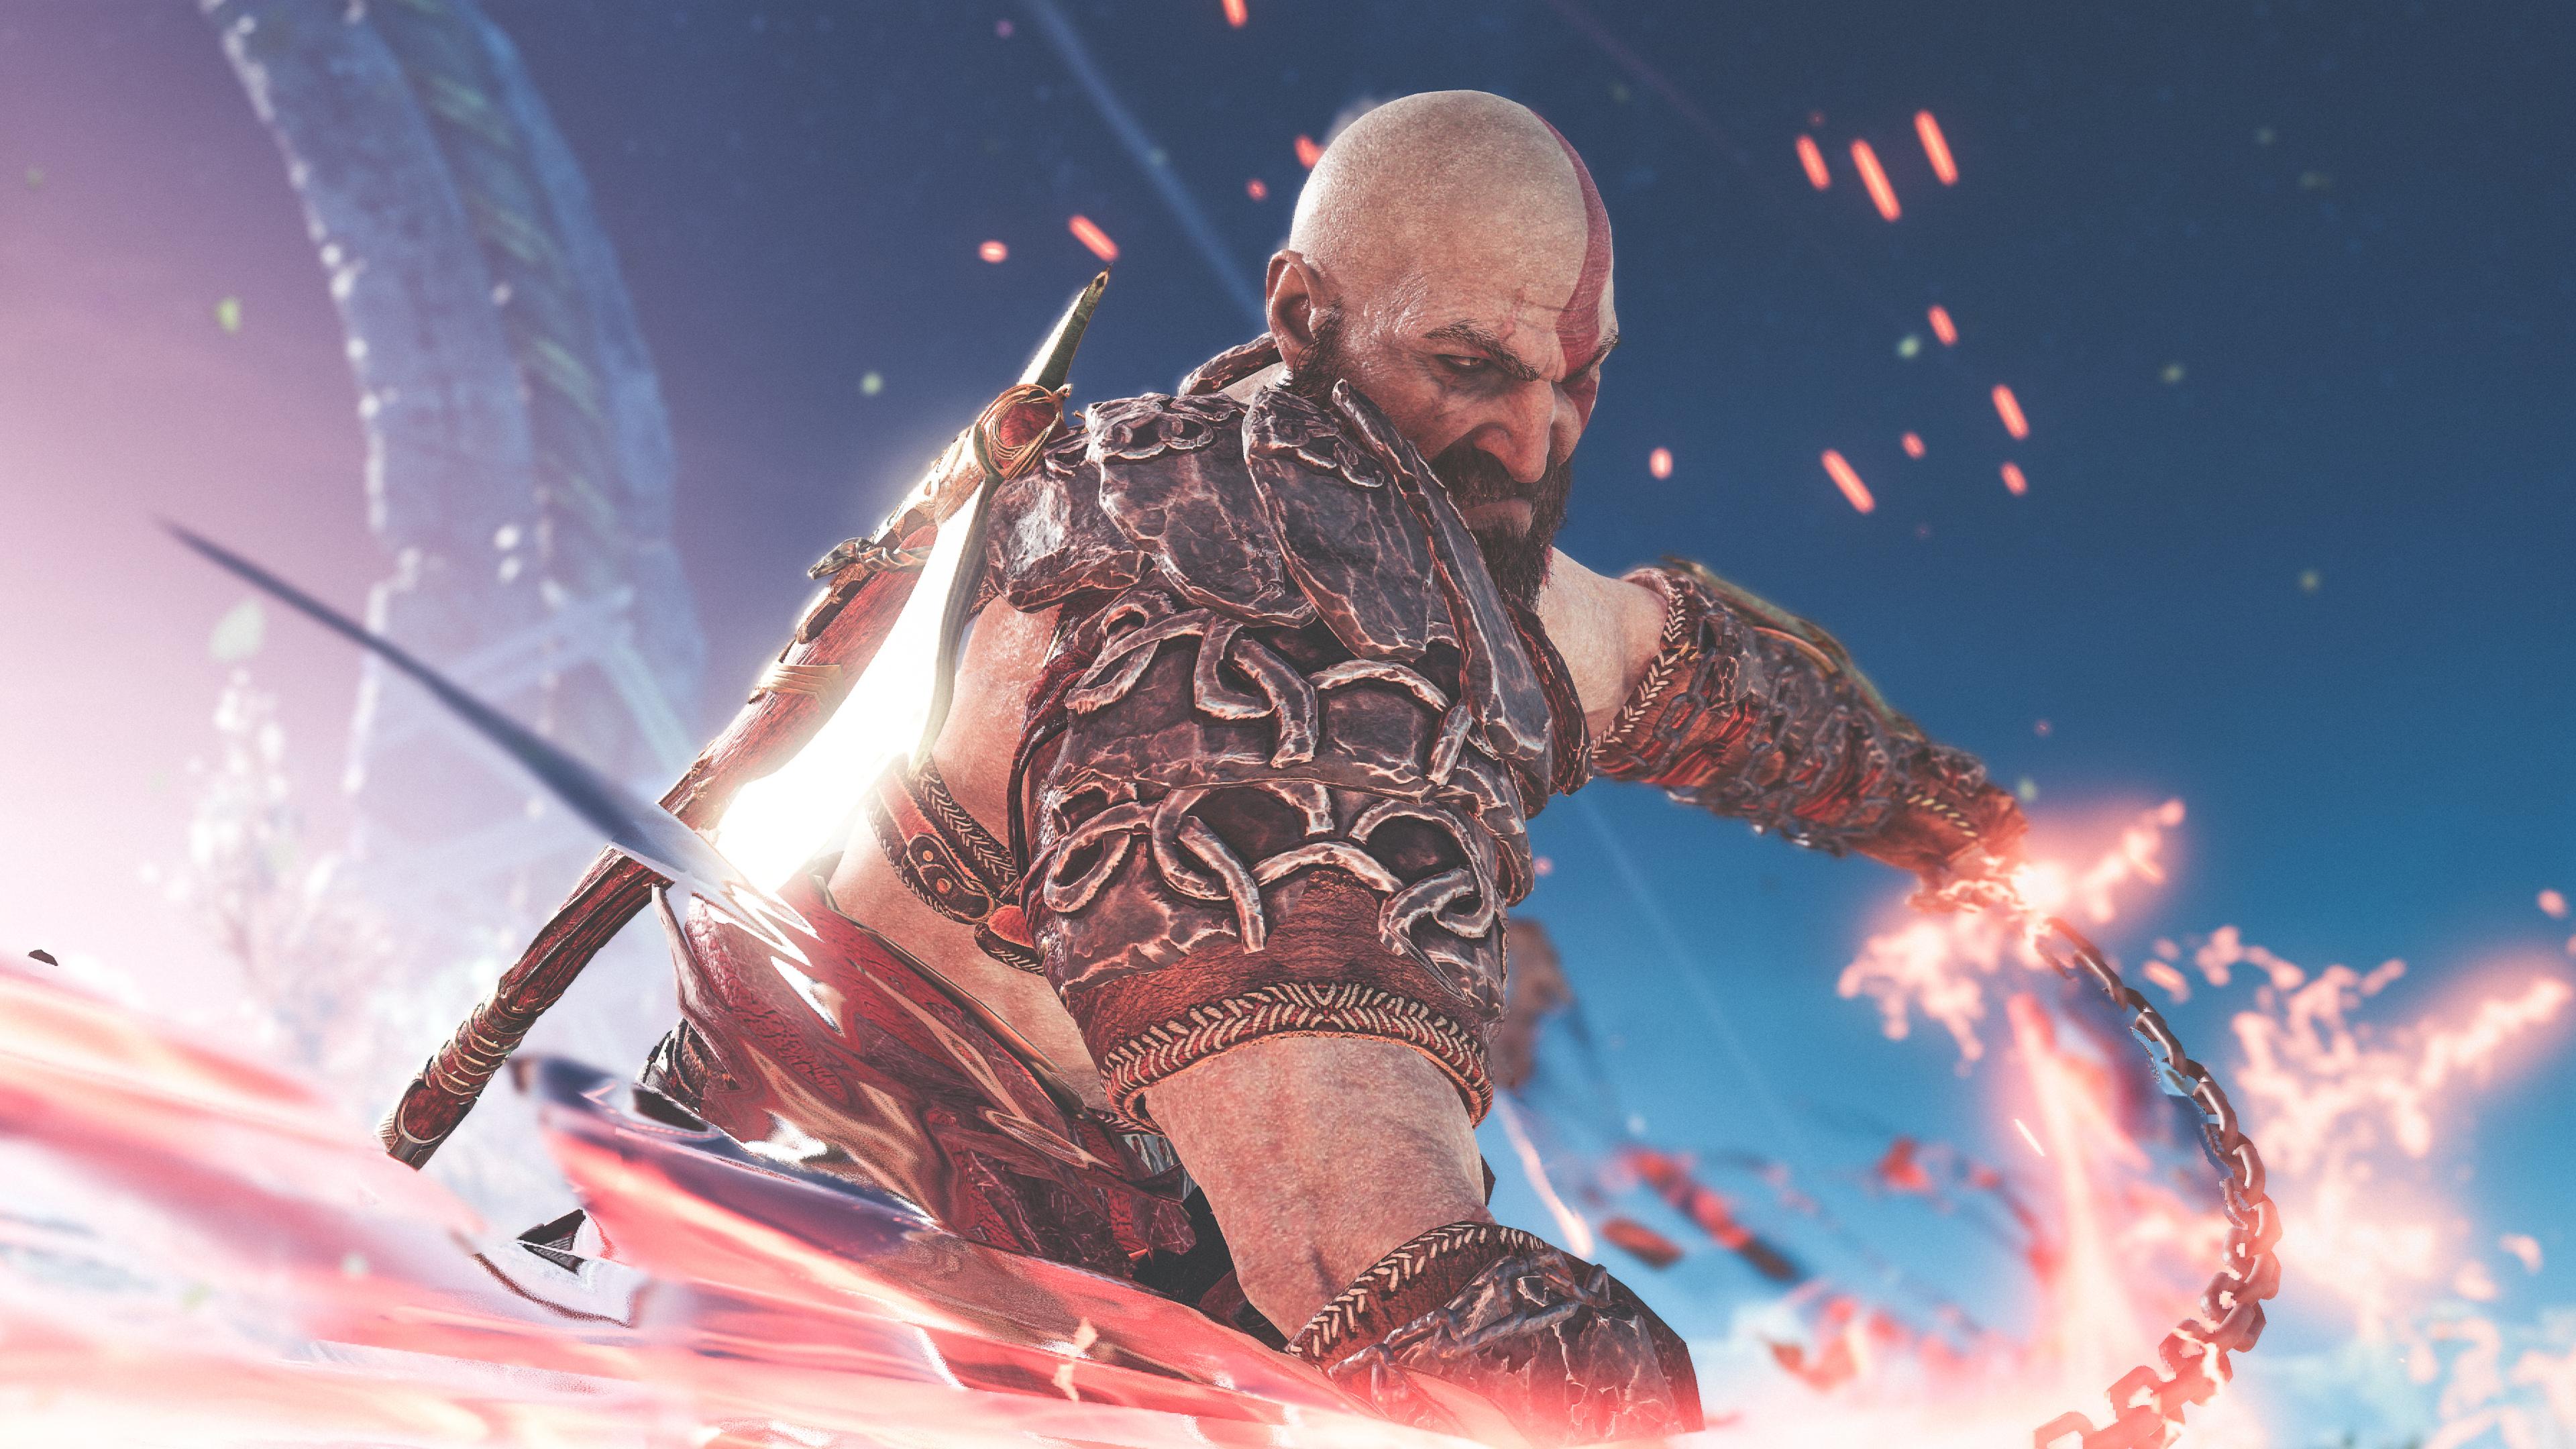 4k-kratos-god-of-war-4-5s.jpg